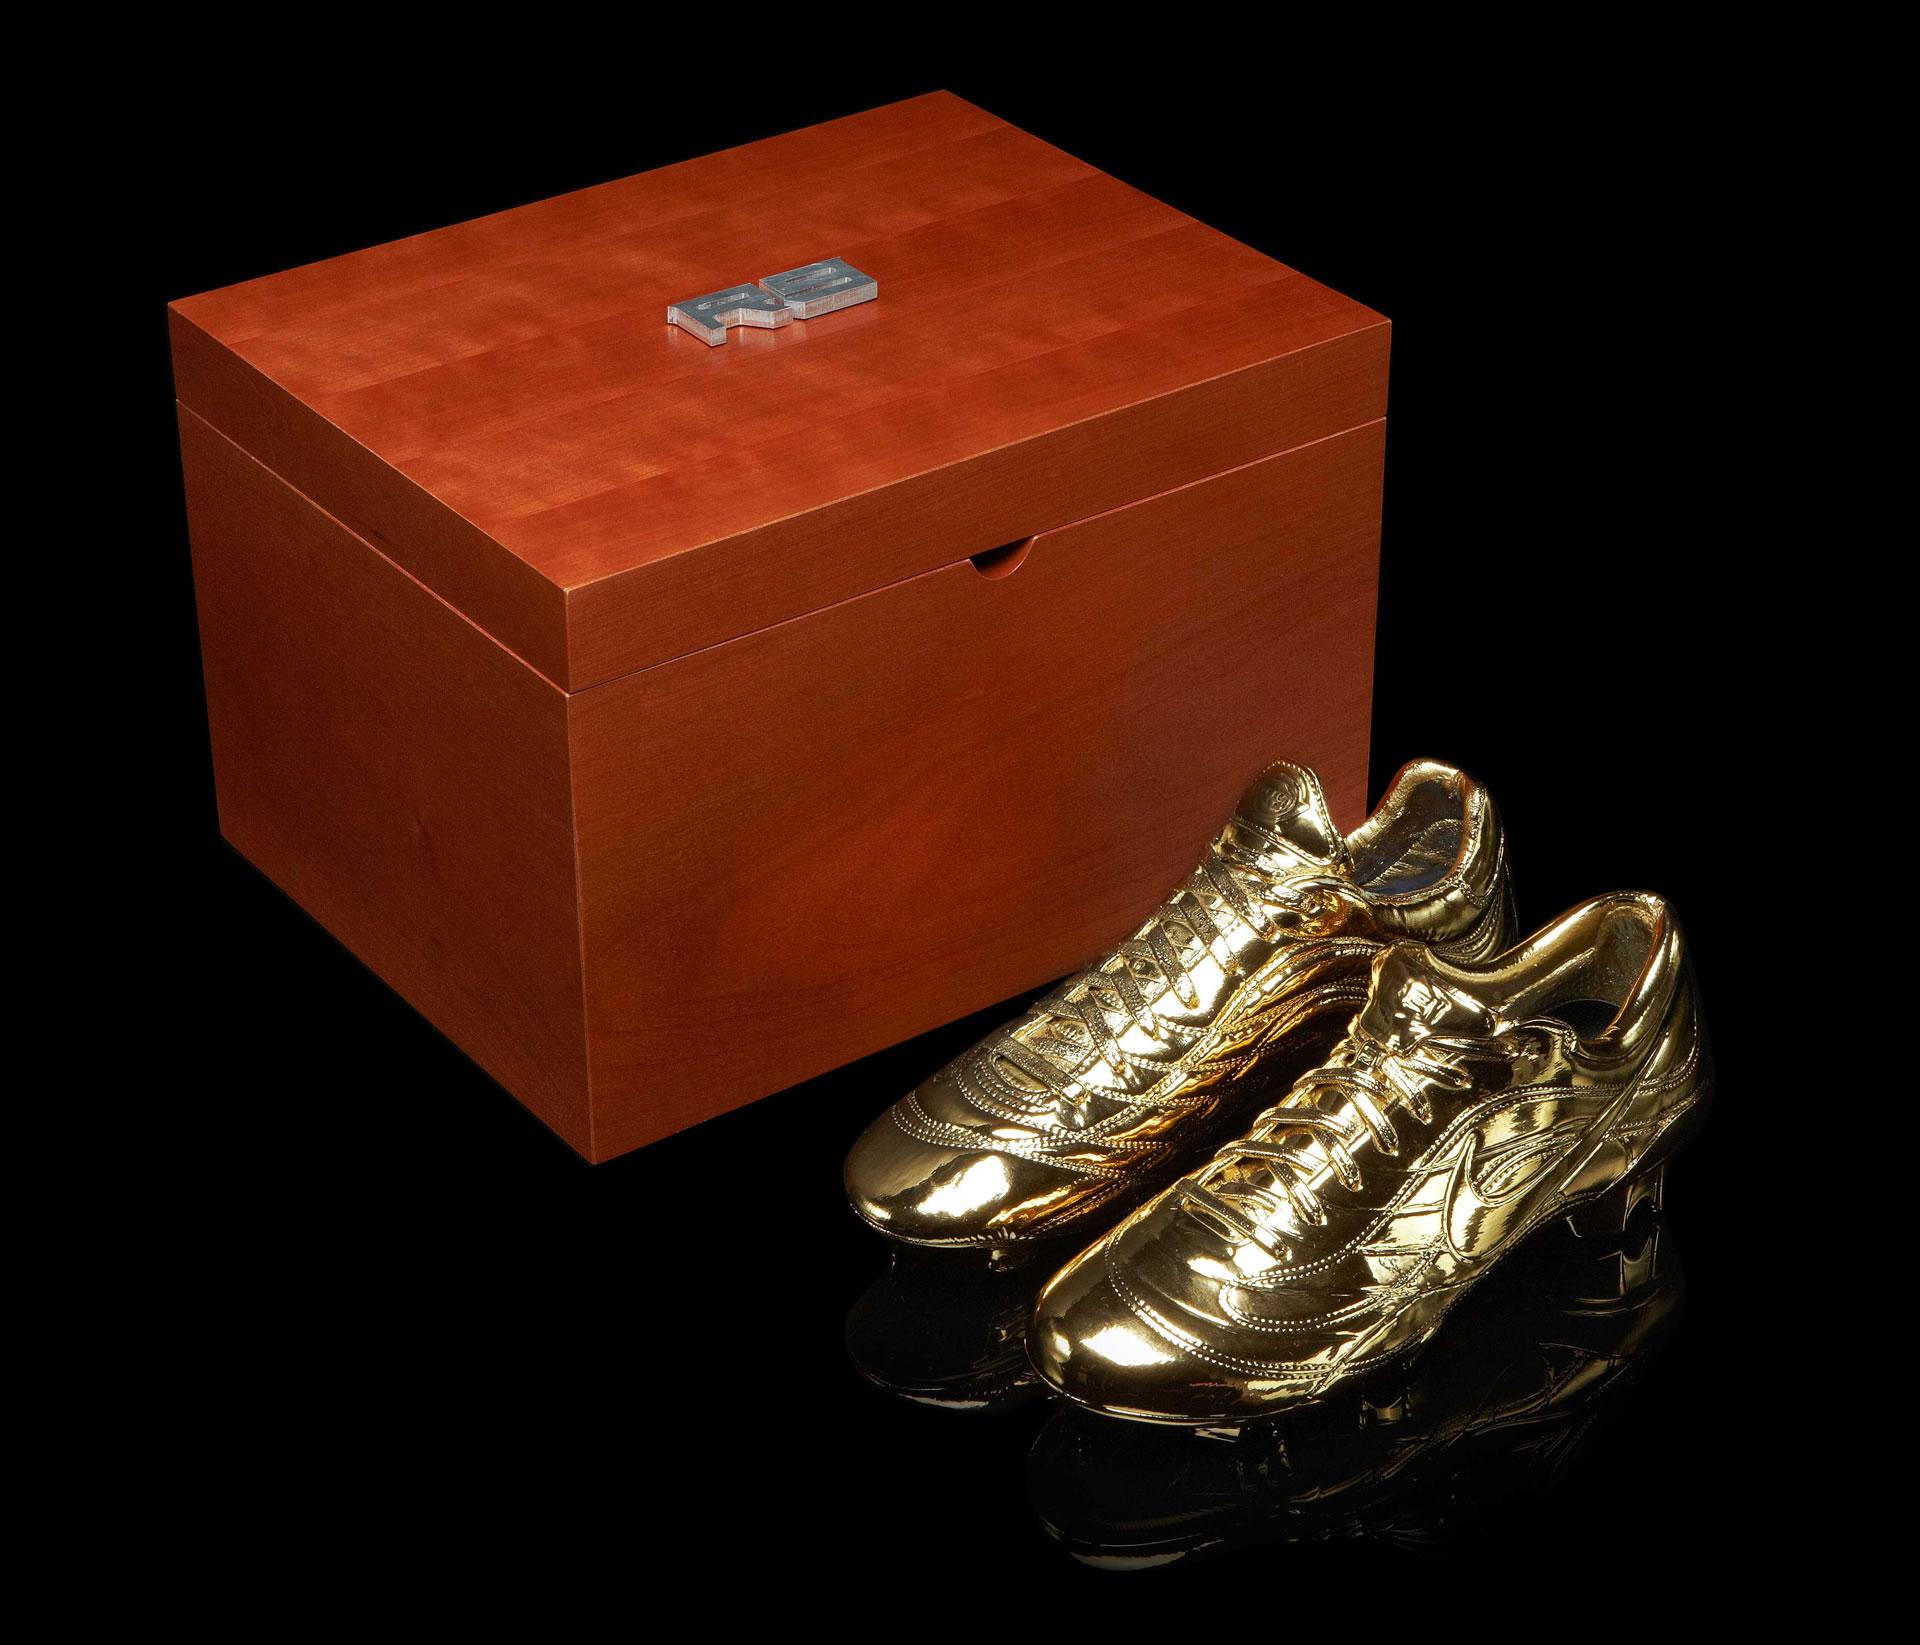 Teuerste nike schuhe der welt  goldene Nike Schuhe für Ronaldo - richtigteuer.de